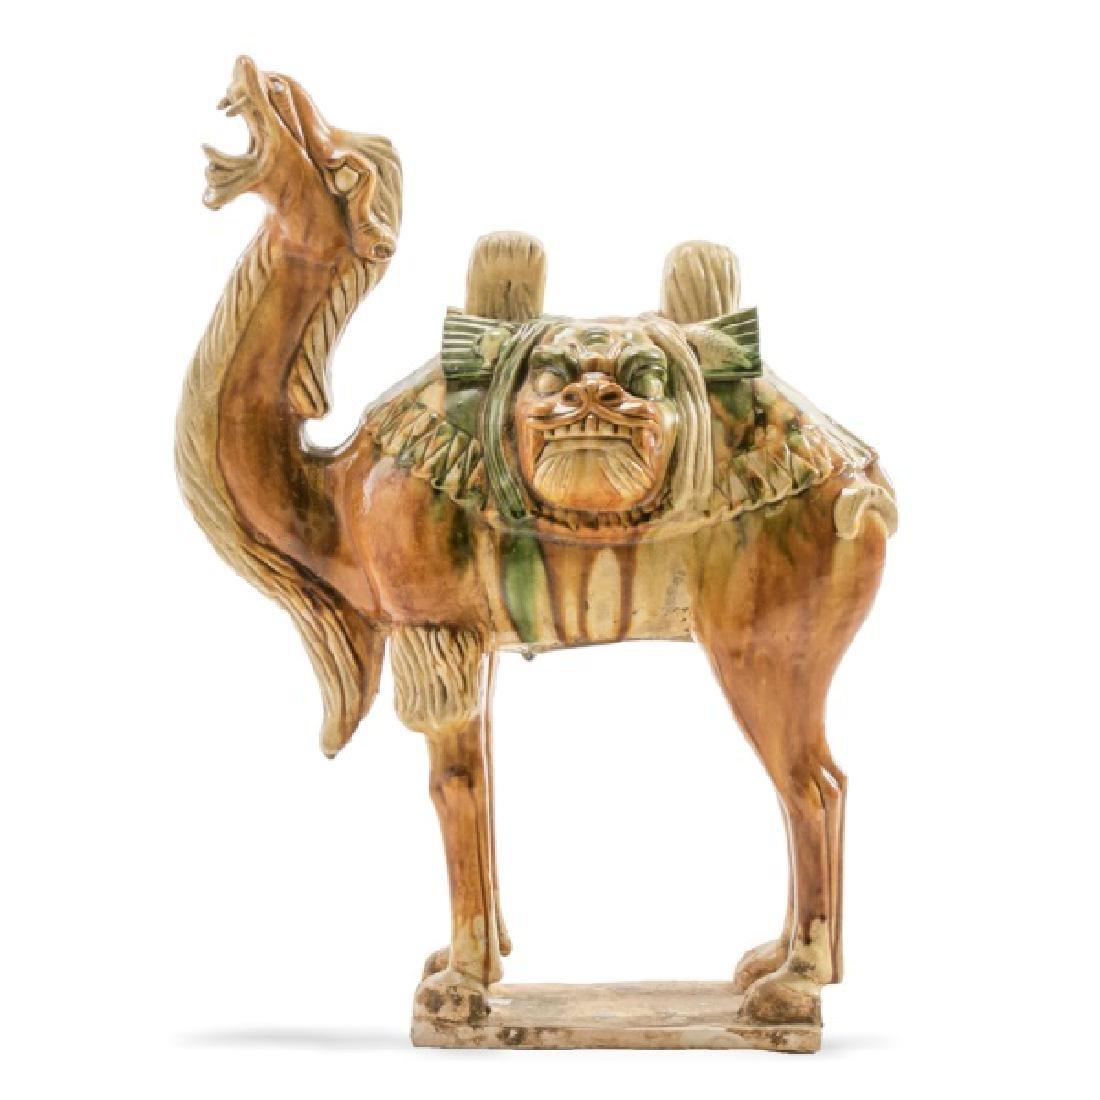 Tang Dynasty Style Sancai Glazed Bactrian Camel